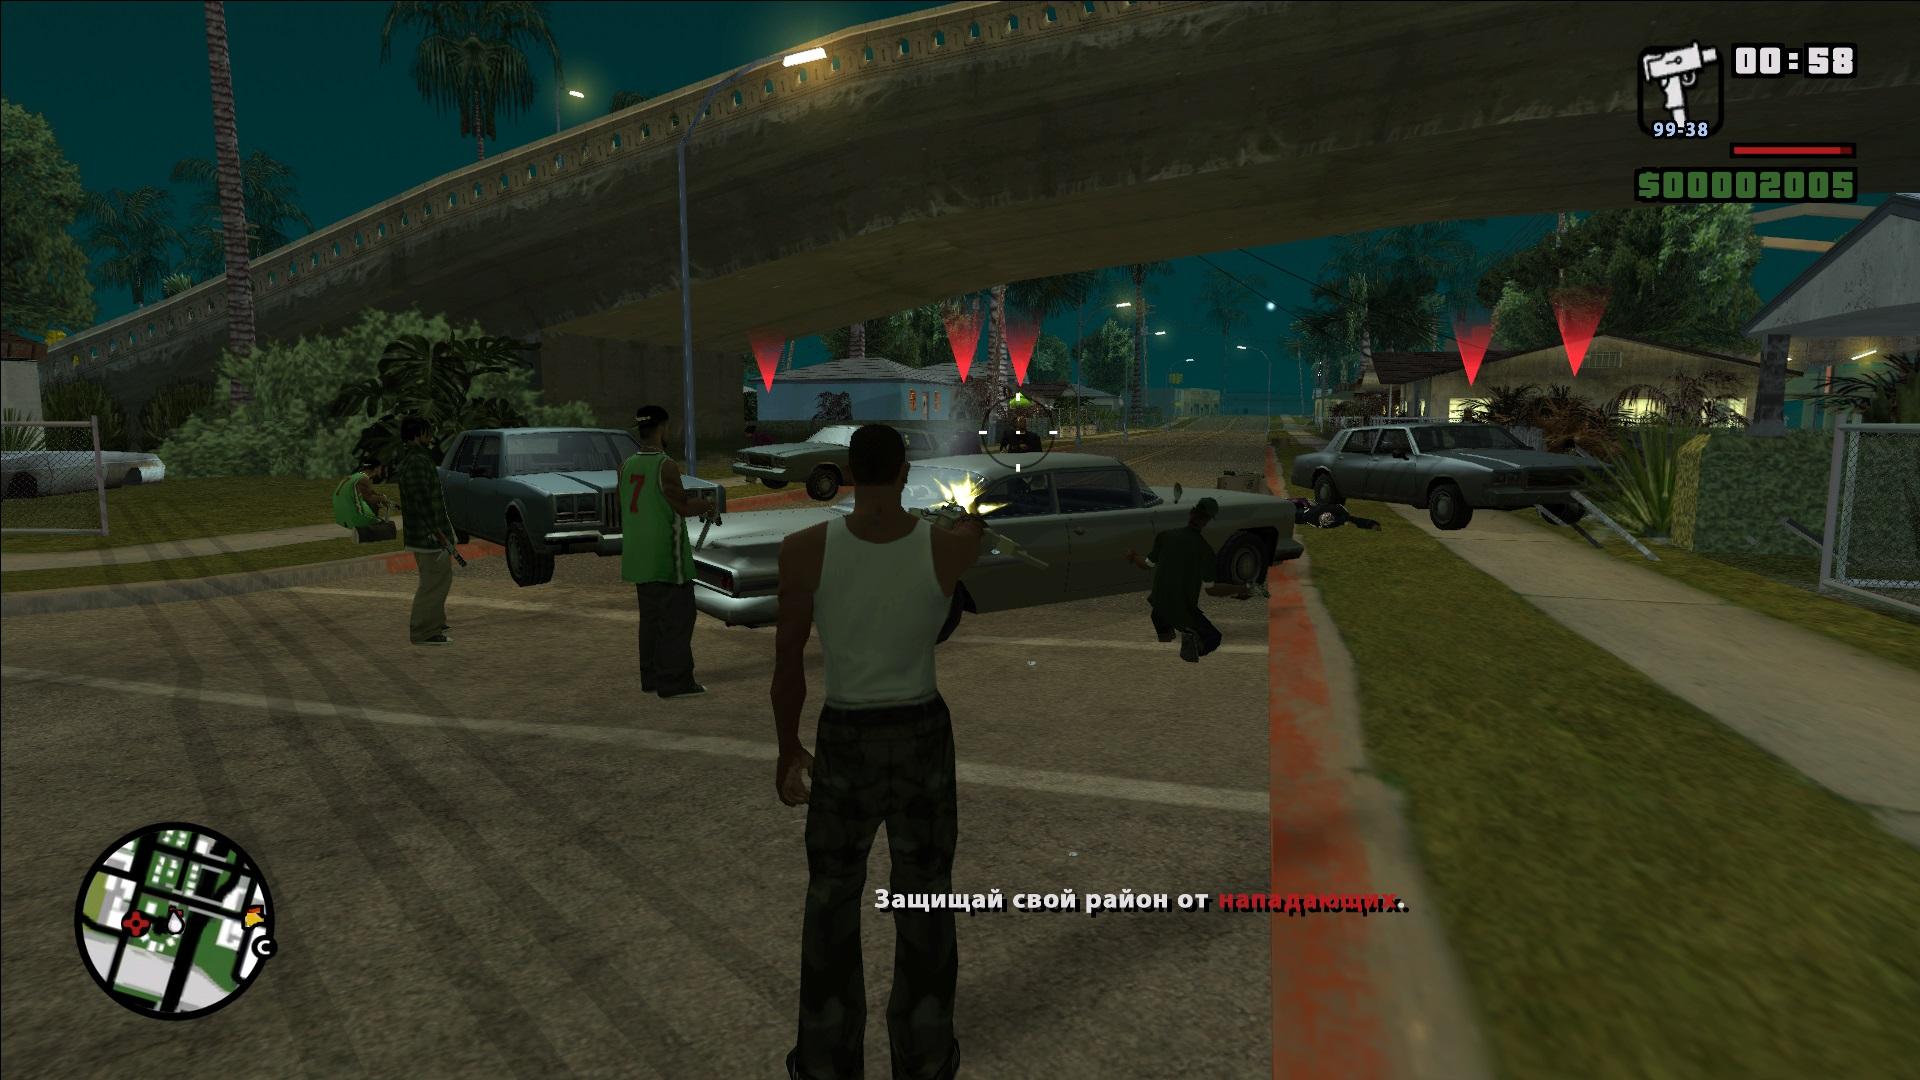 GTA San Andreas (mod - full screen and PS2 sun bloor) - Grand Theft Auto: San Andreas Моды